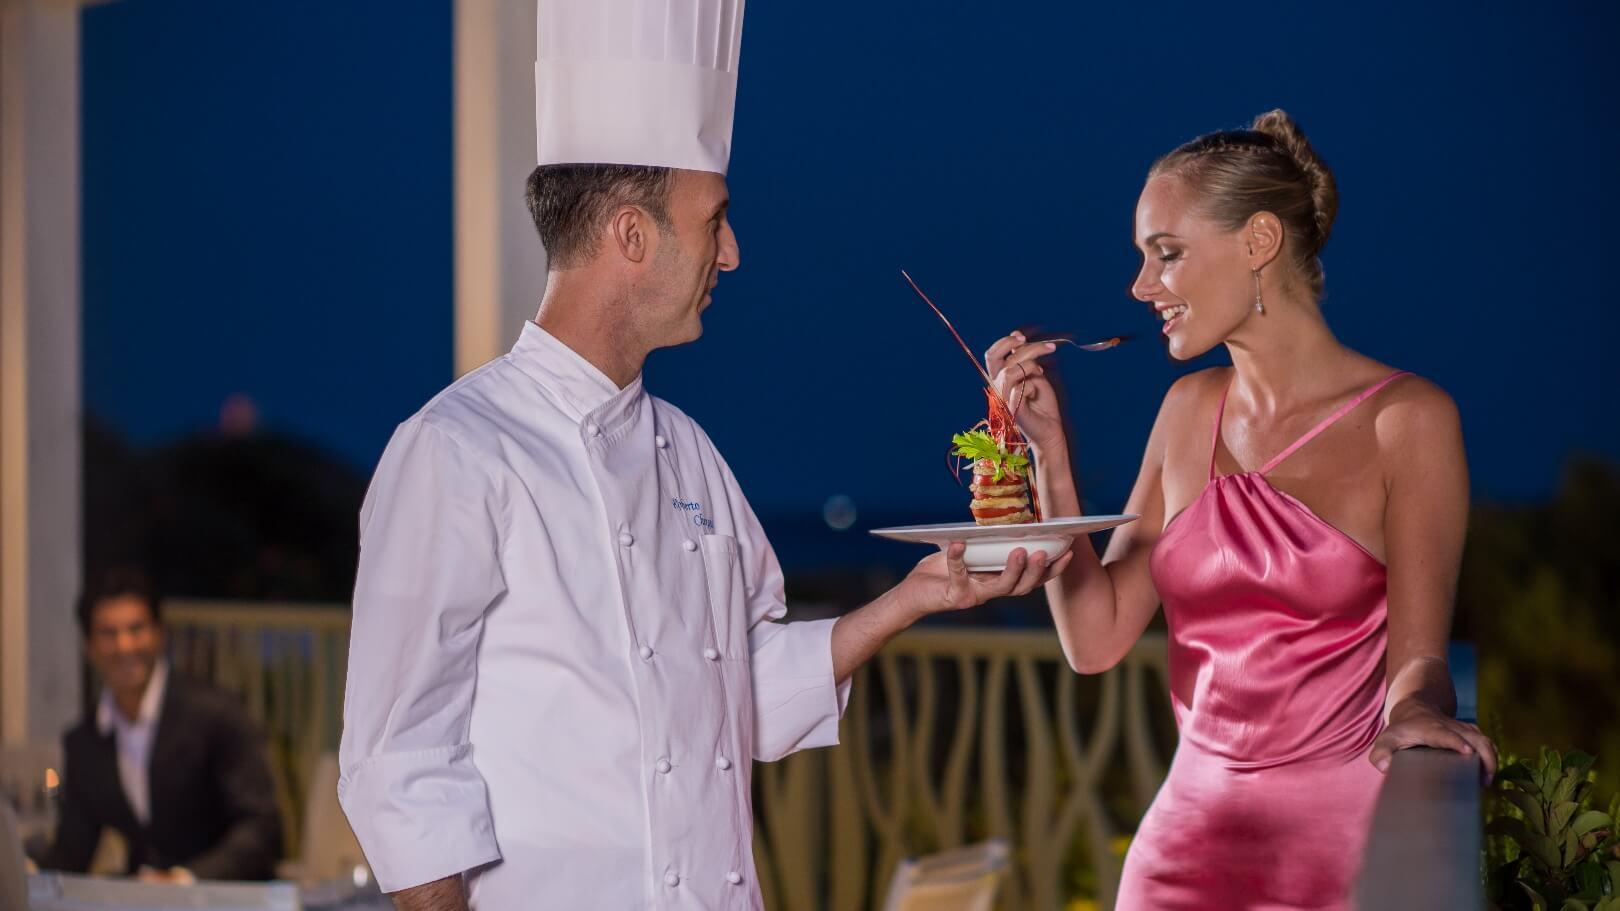 https://www.chialagunaresort.com/wp-content/uploads/2021/04/IHC_Chia-Laguna-Resort_grid_CL4U_dinner-gourmet.jpg